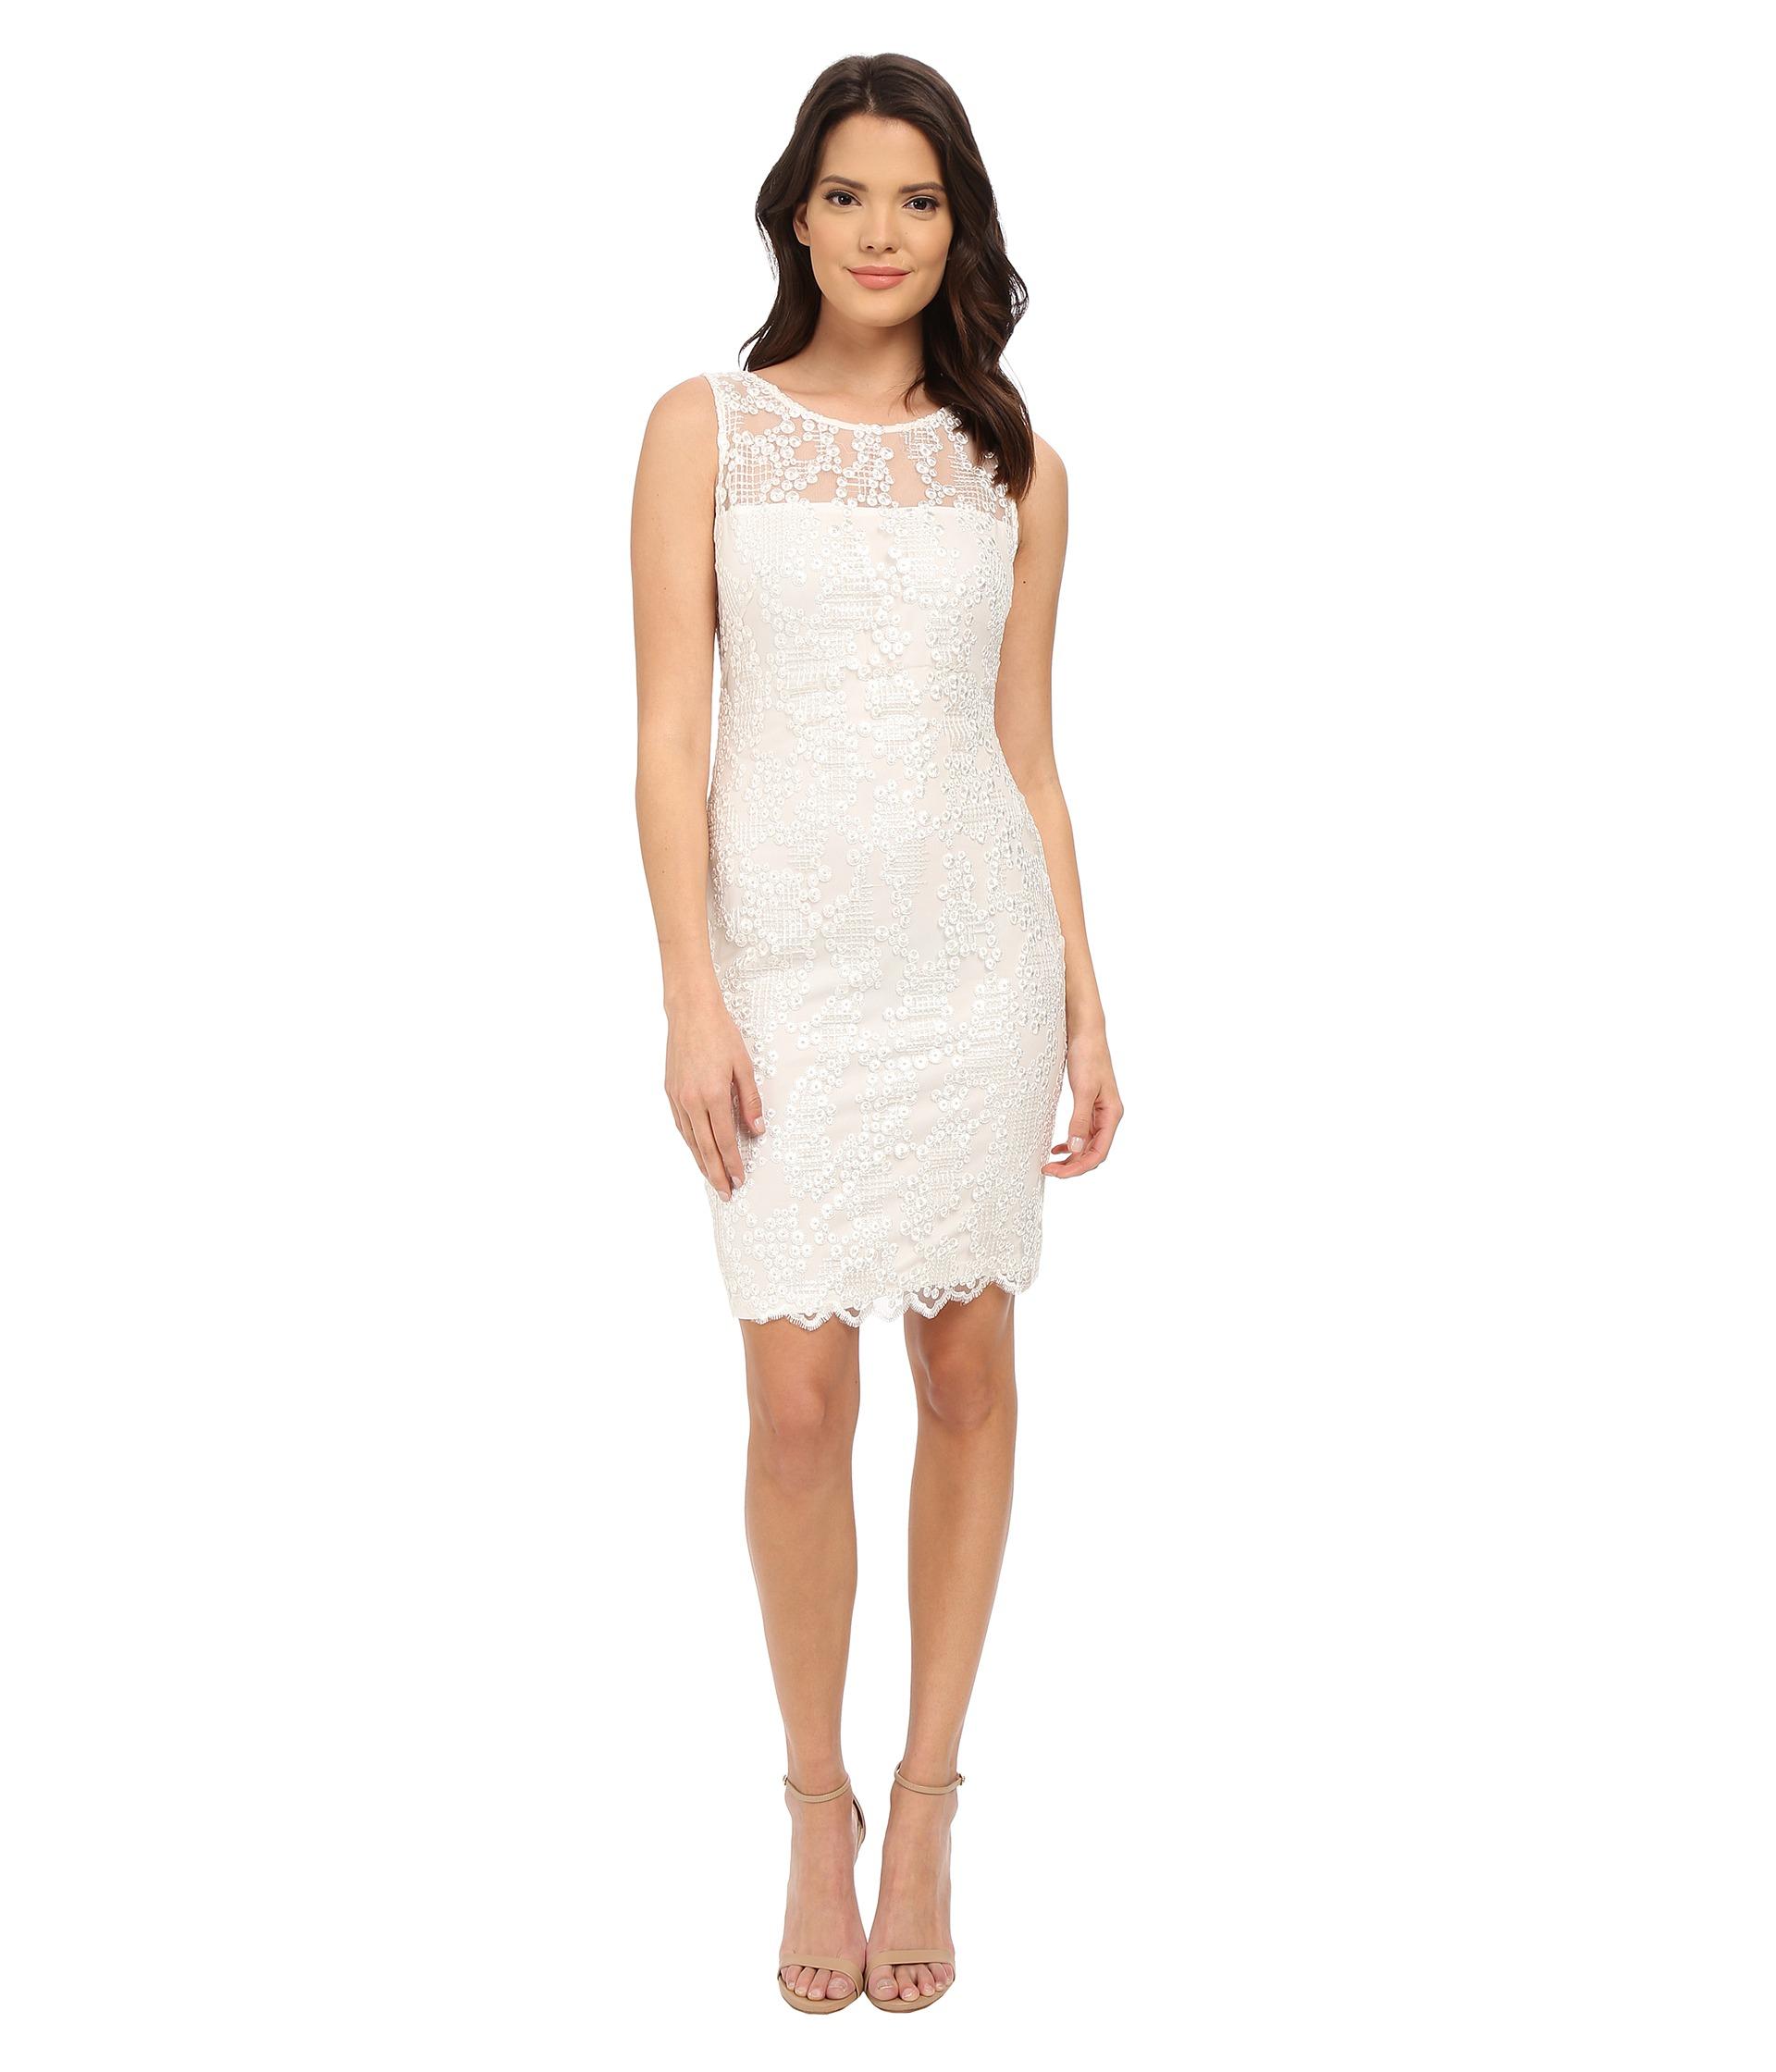 Calvin klein Lace Sheath Dress Cd5b4m6c in White | Lyst